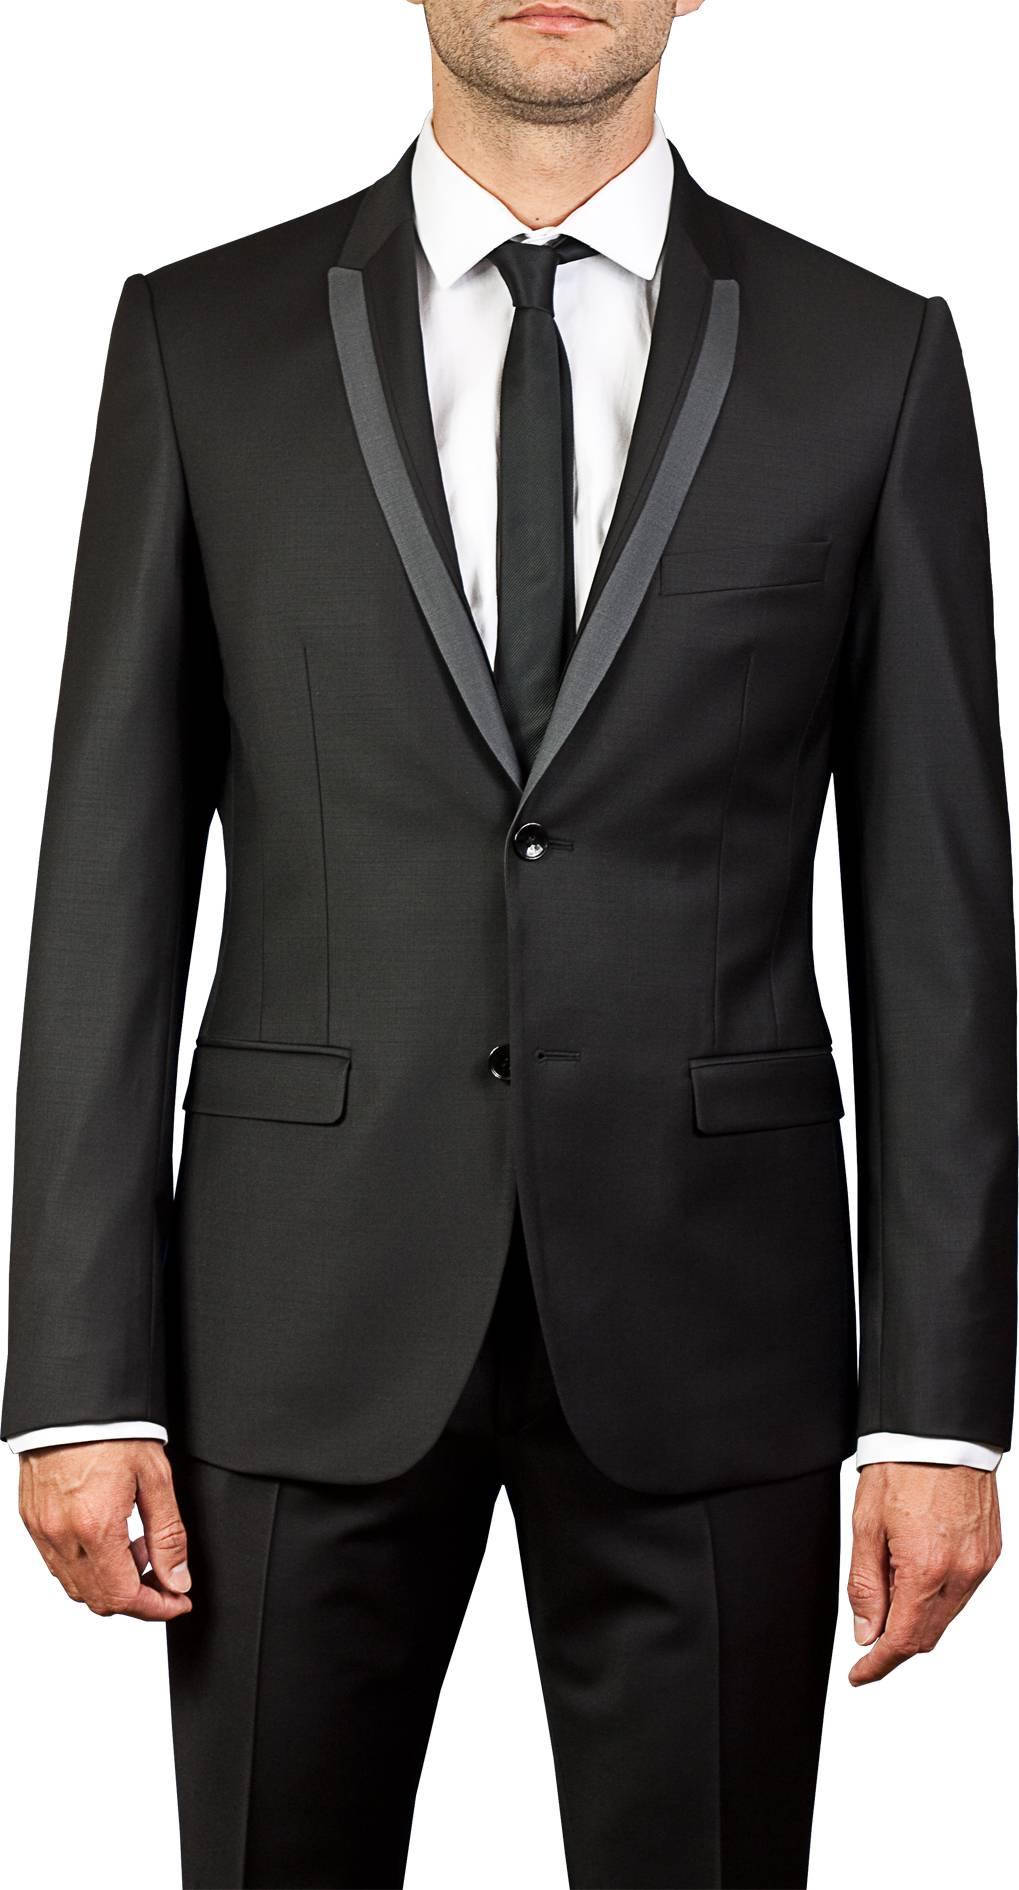 Acheter son costume de mari marseille proche aix en for Acheter a marseille